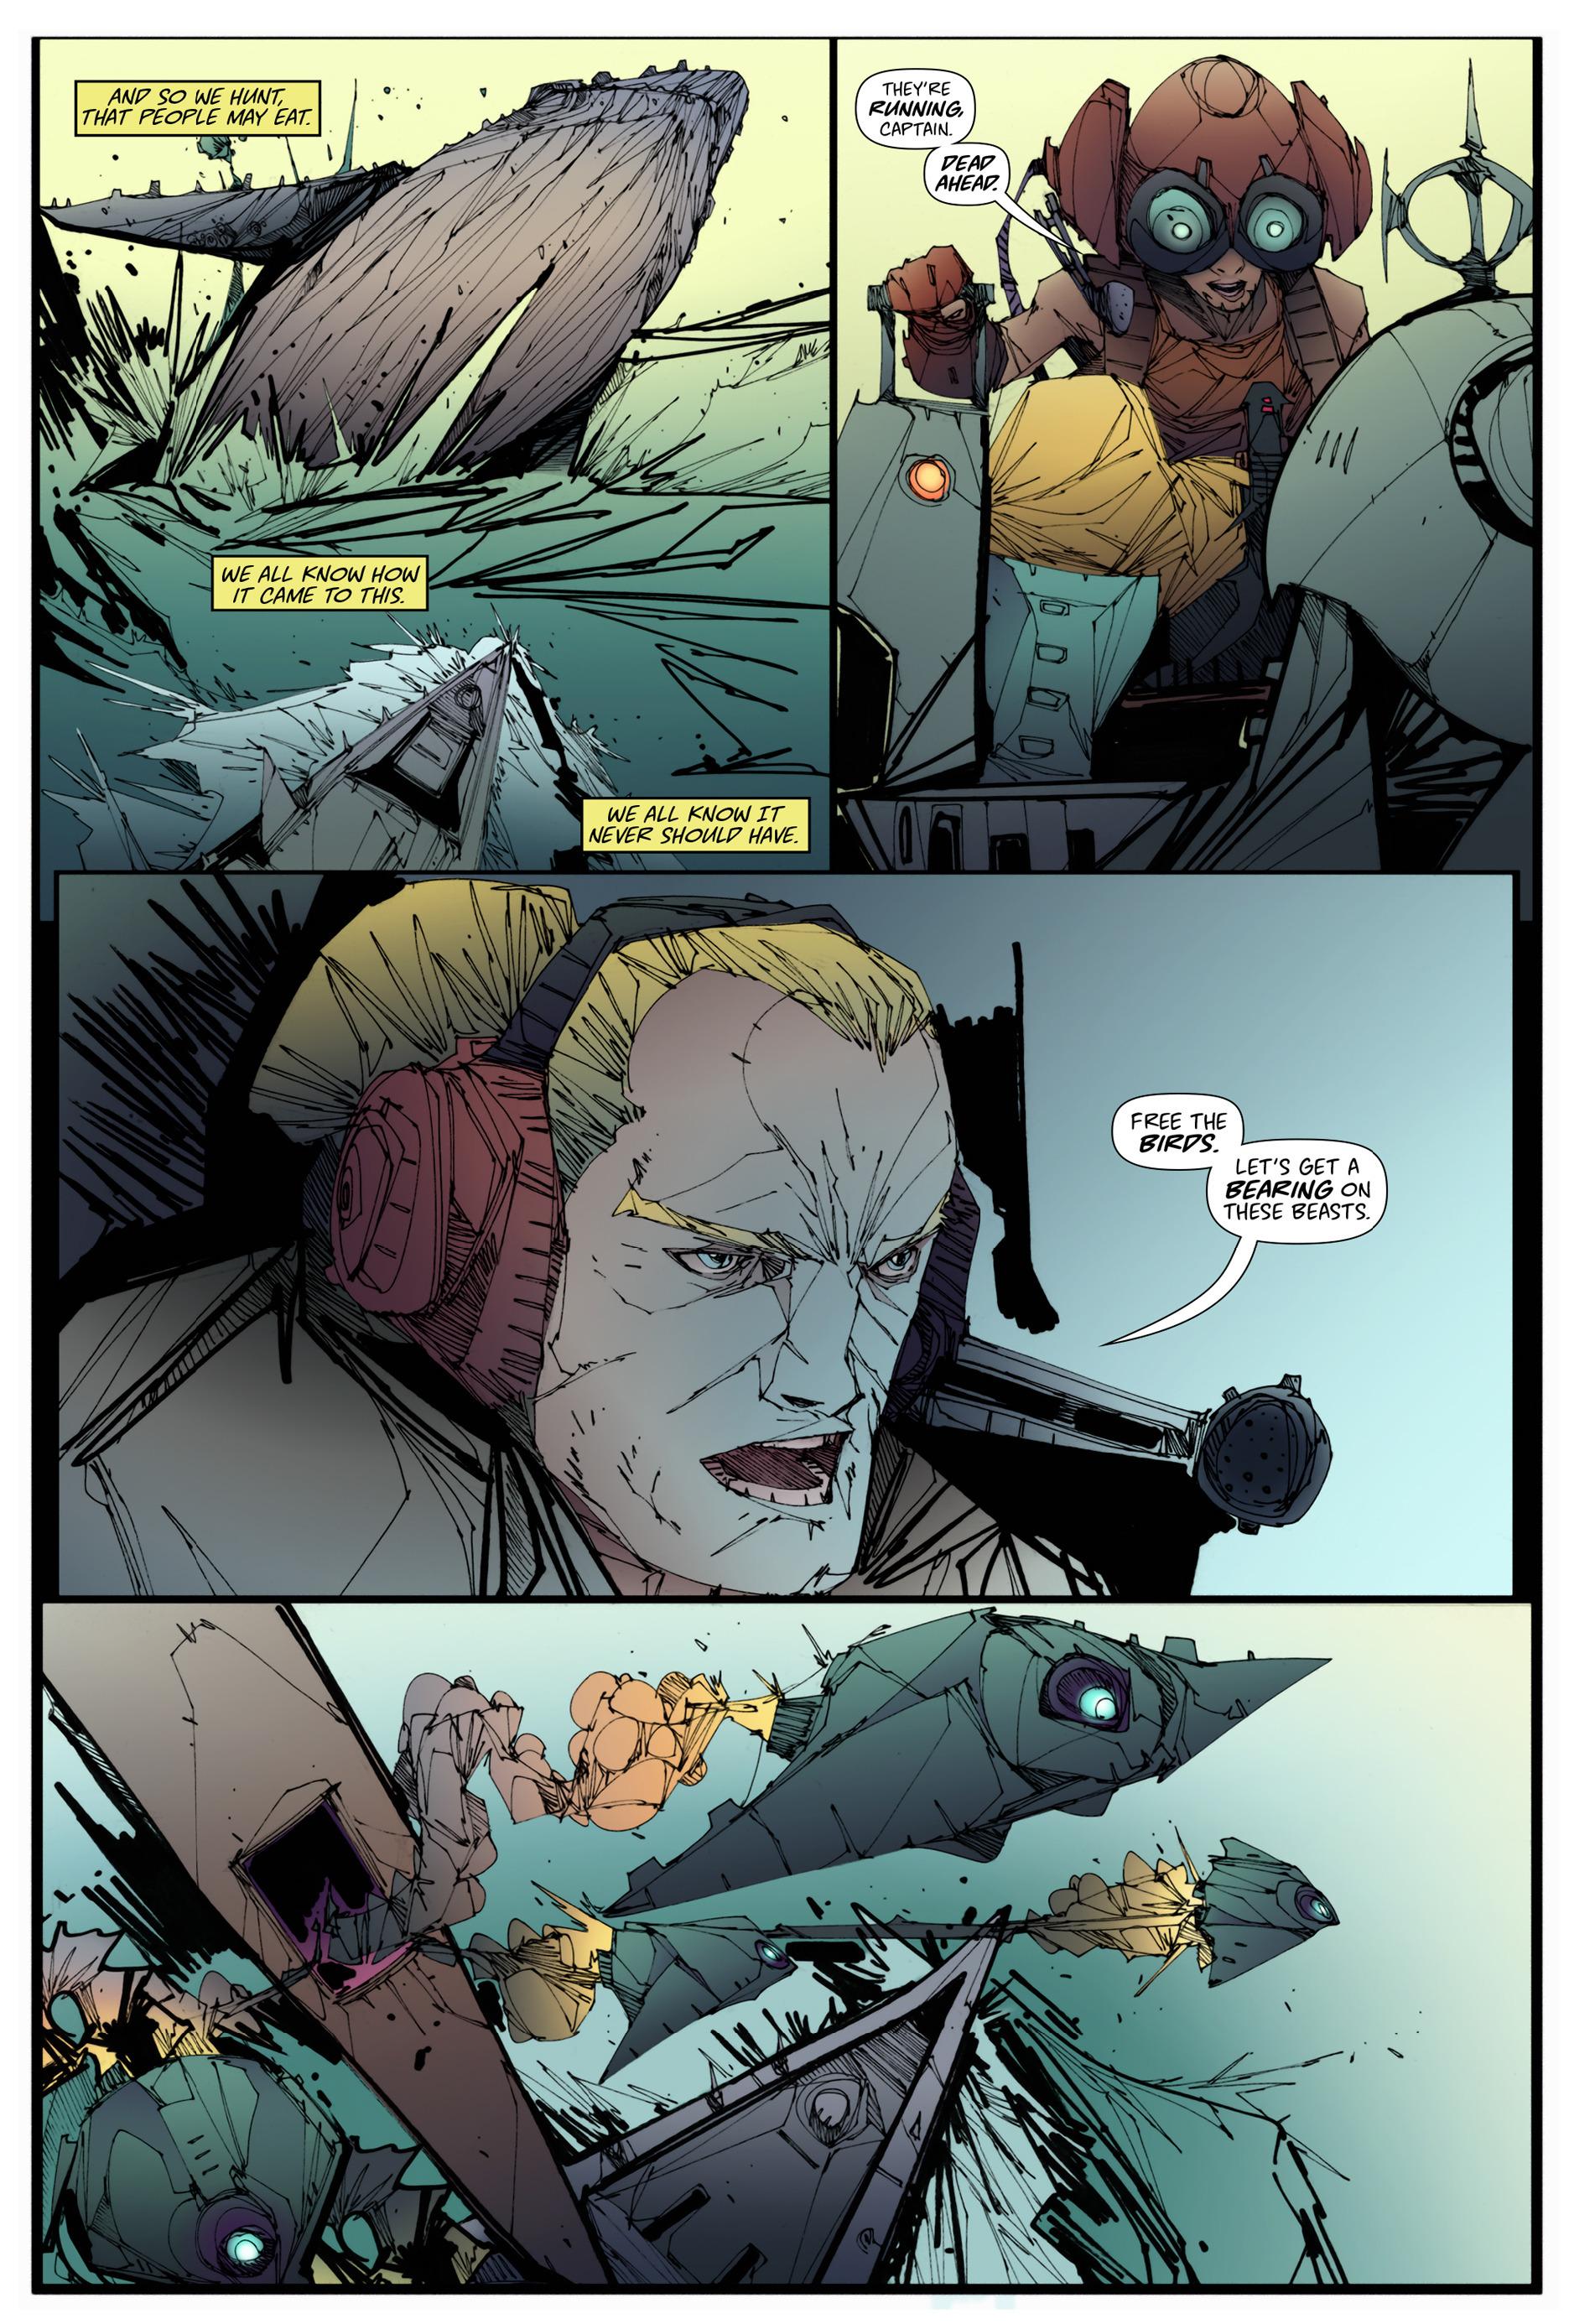 Read online Scrimshaw comic -  Issue #2 - 11